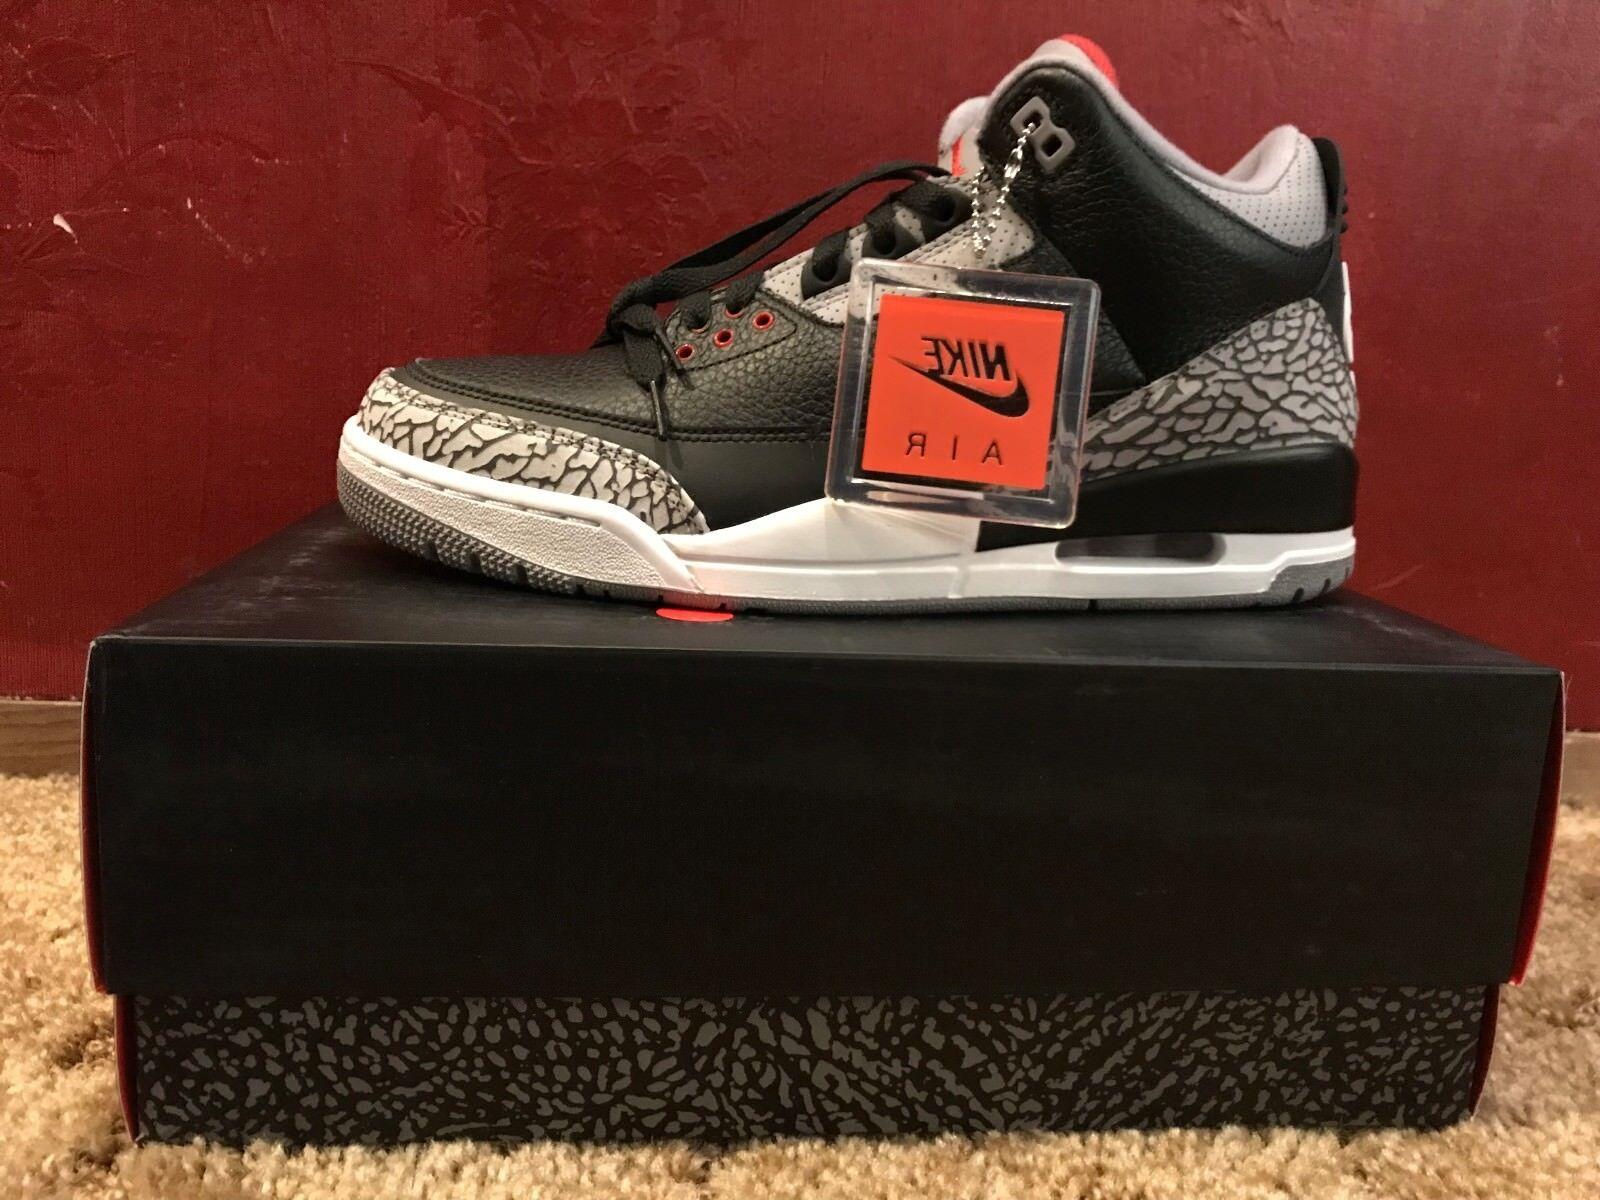 Nike AIR JORDAN RETRO 3 BLACK CEMENT Size 10 SHIPS NEXT DAY